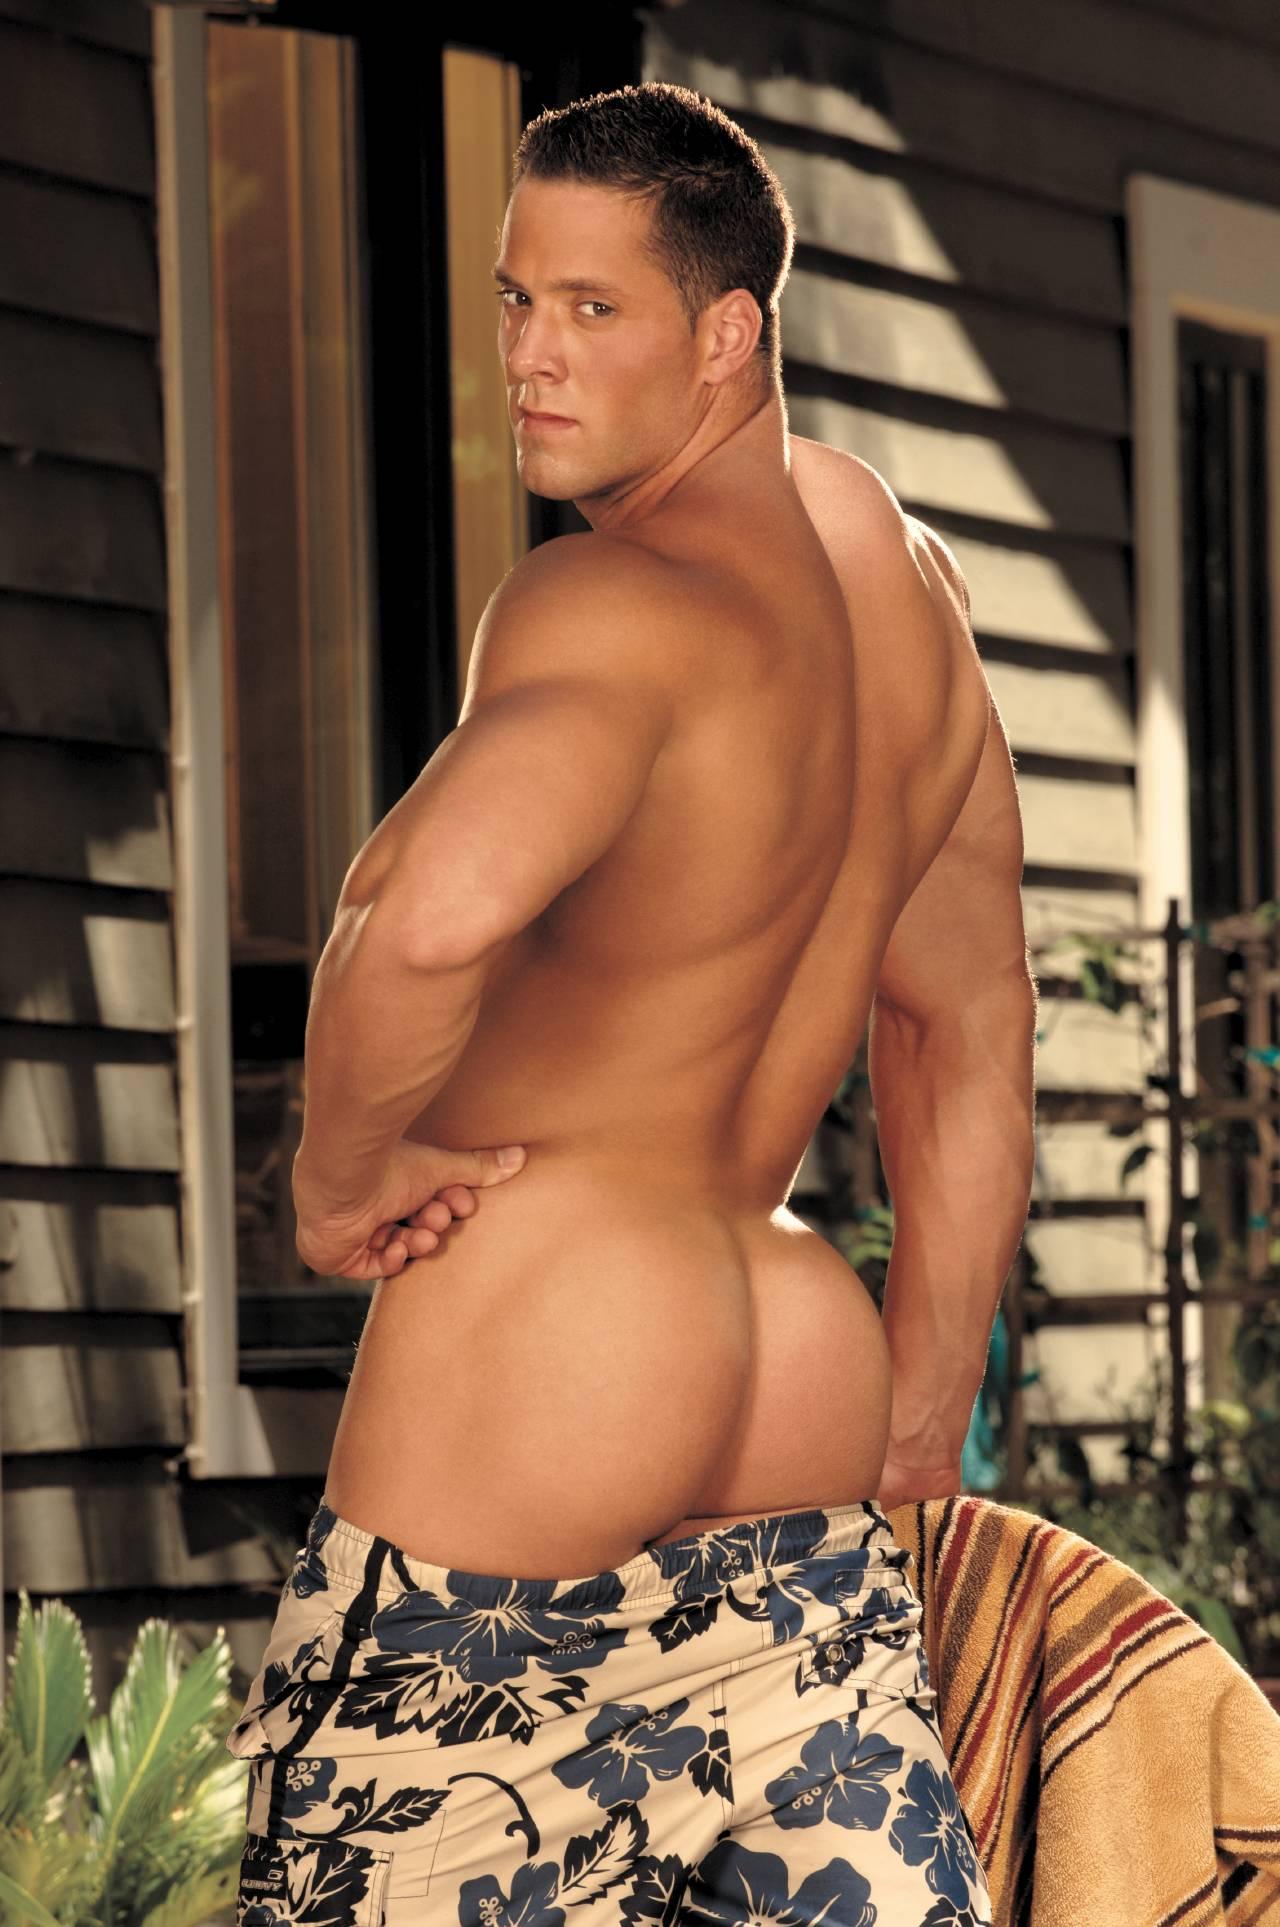 from Dalton erik is gay